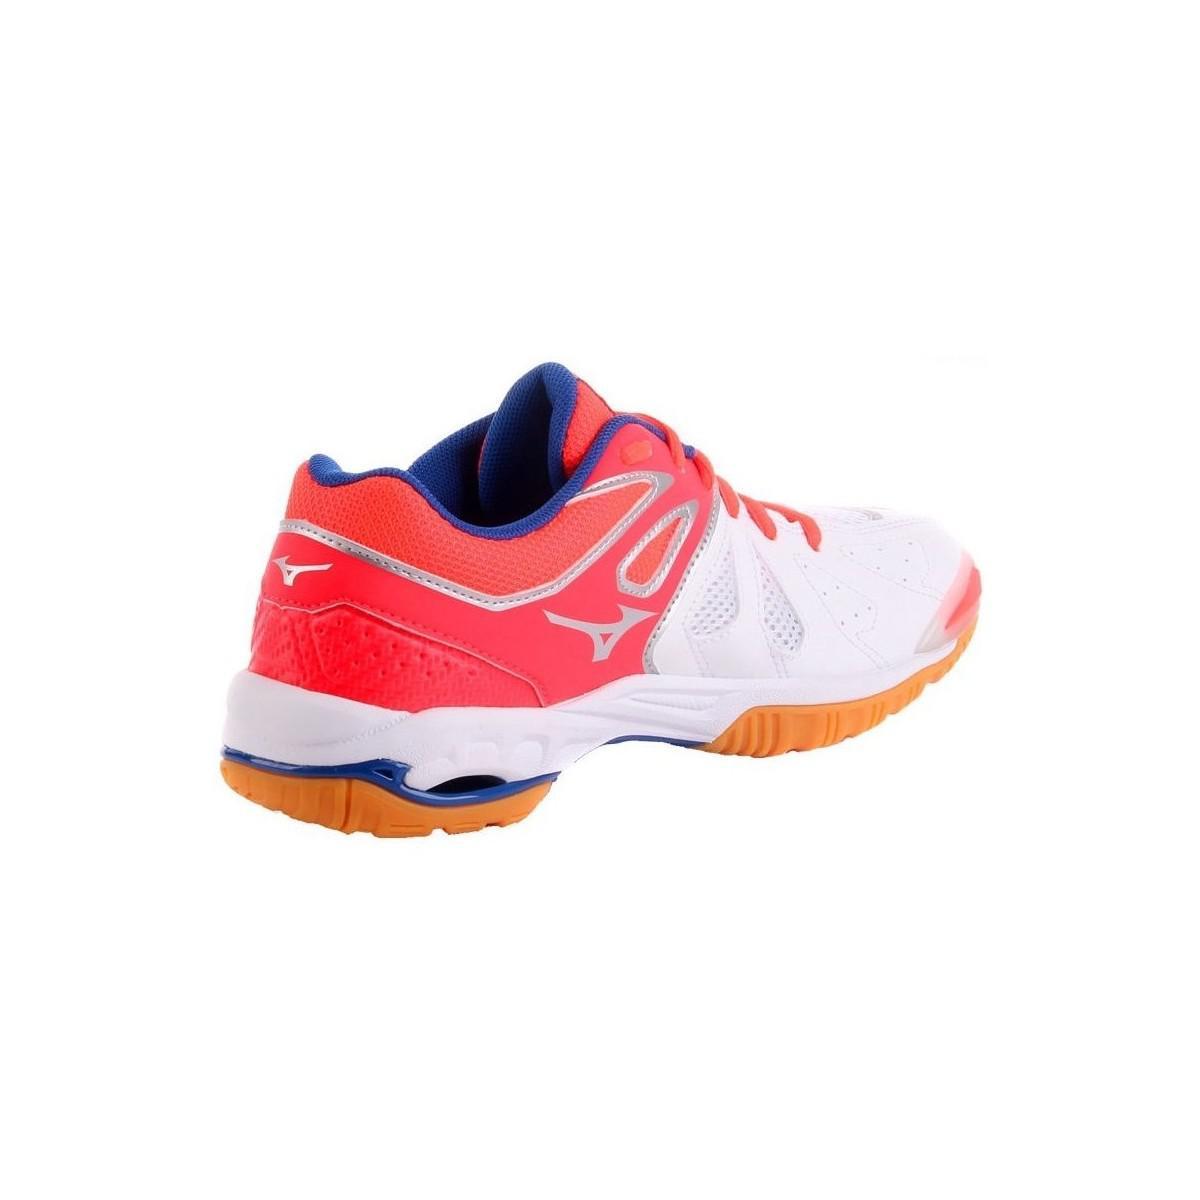 7232c72e8cf6 Mizuno Wave Phantom Womens Women's Shoes (trainers) In White in ...